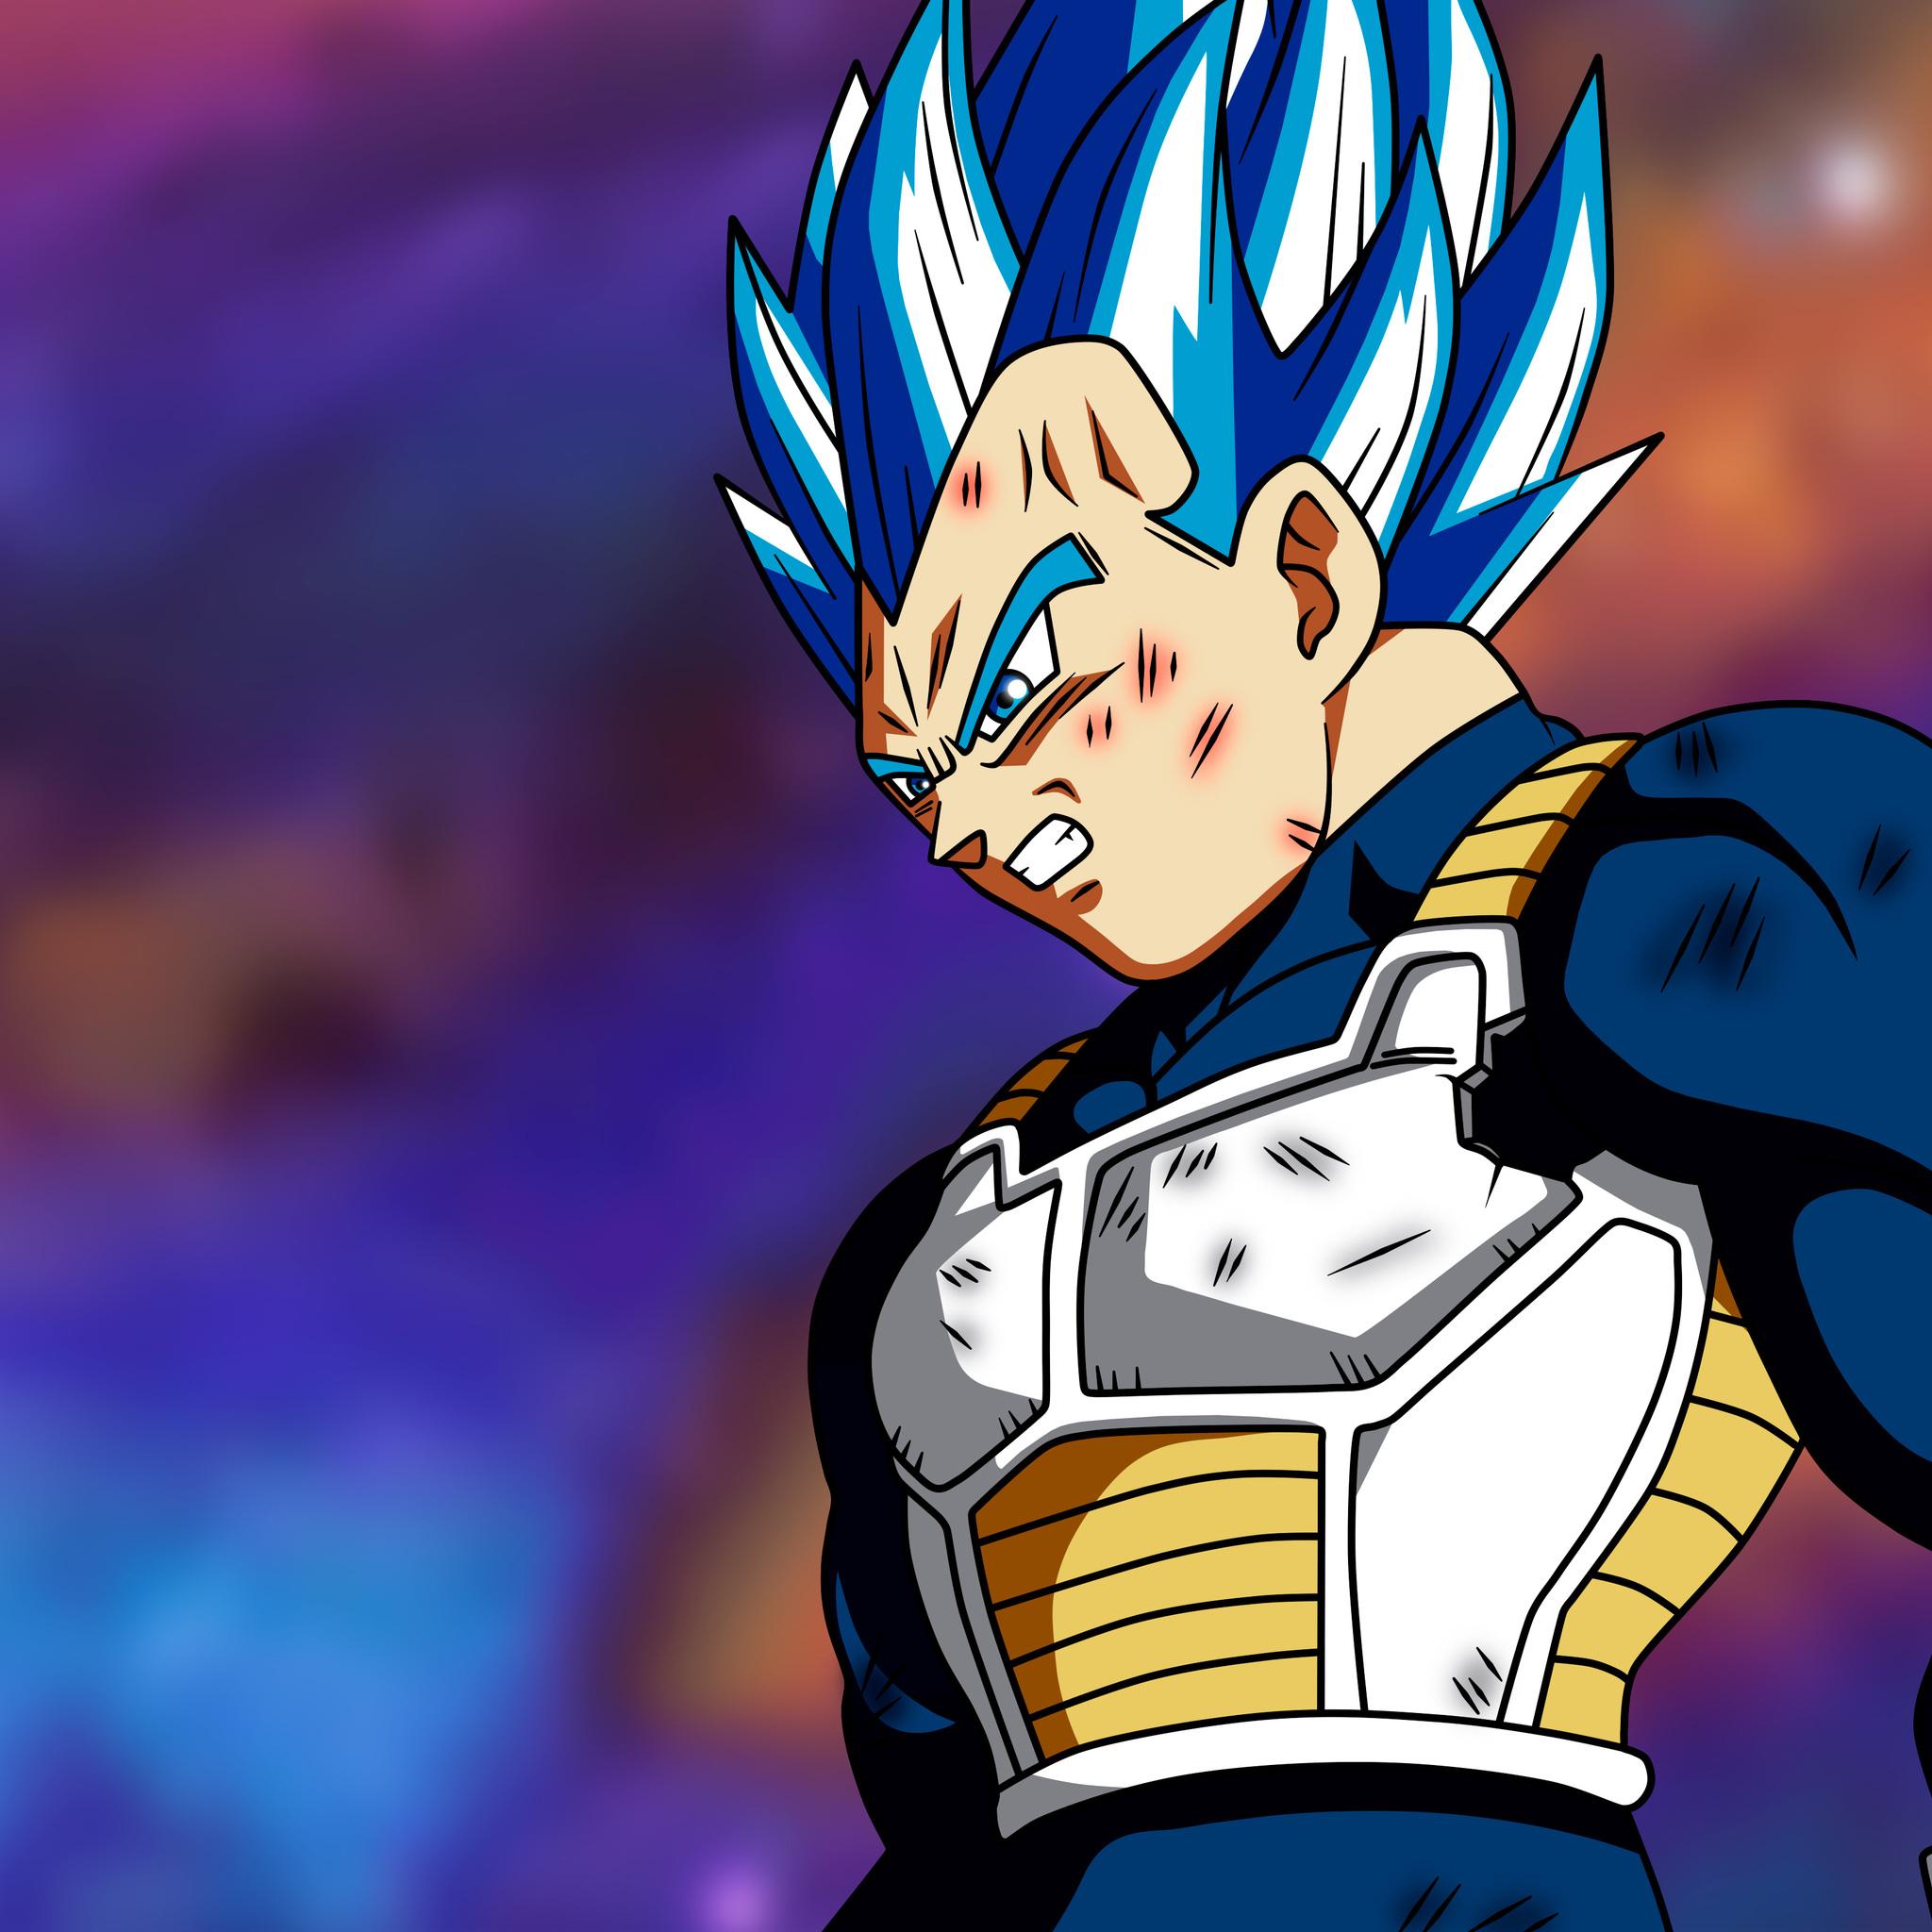 2048x2048 Goku Migatte No Gokui Dragon Ball Super 4k Ipad